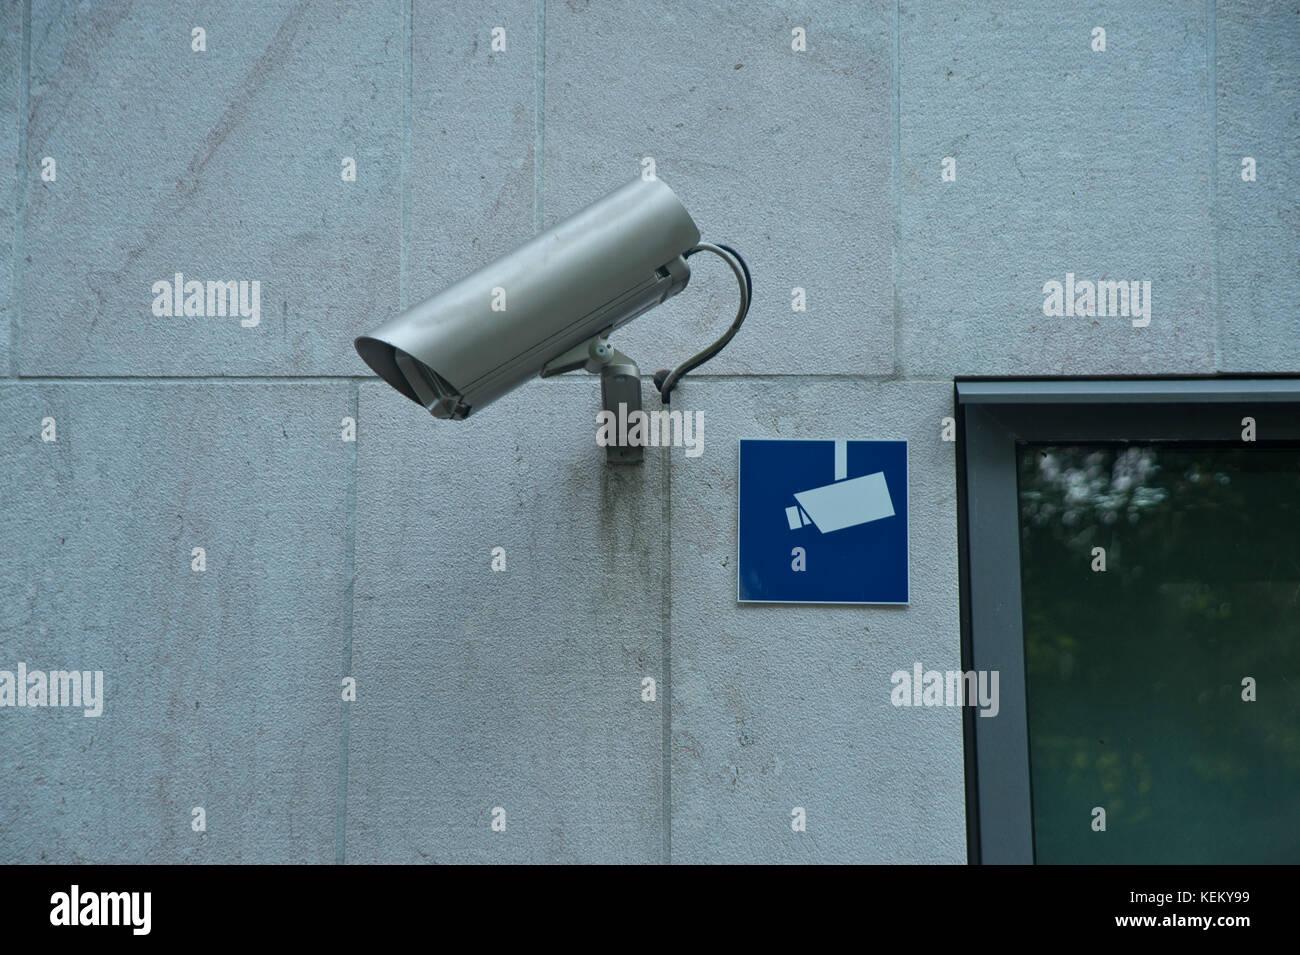 Symbolbild Videoüberwachung - Videoüberwachung mit Symbol Stockbild